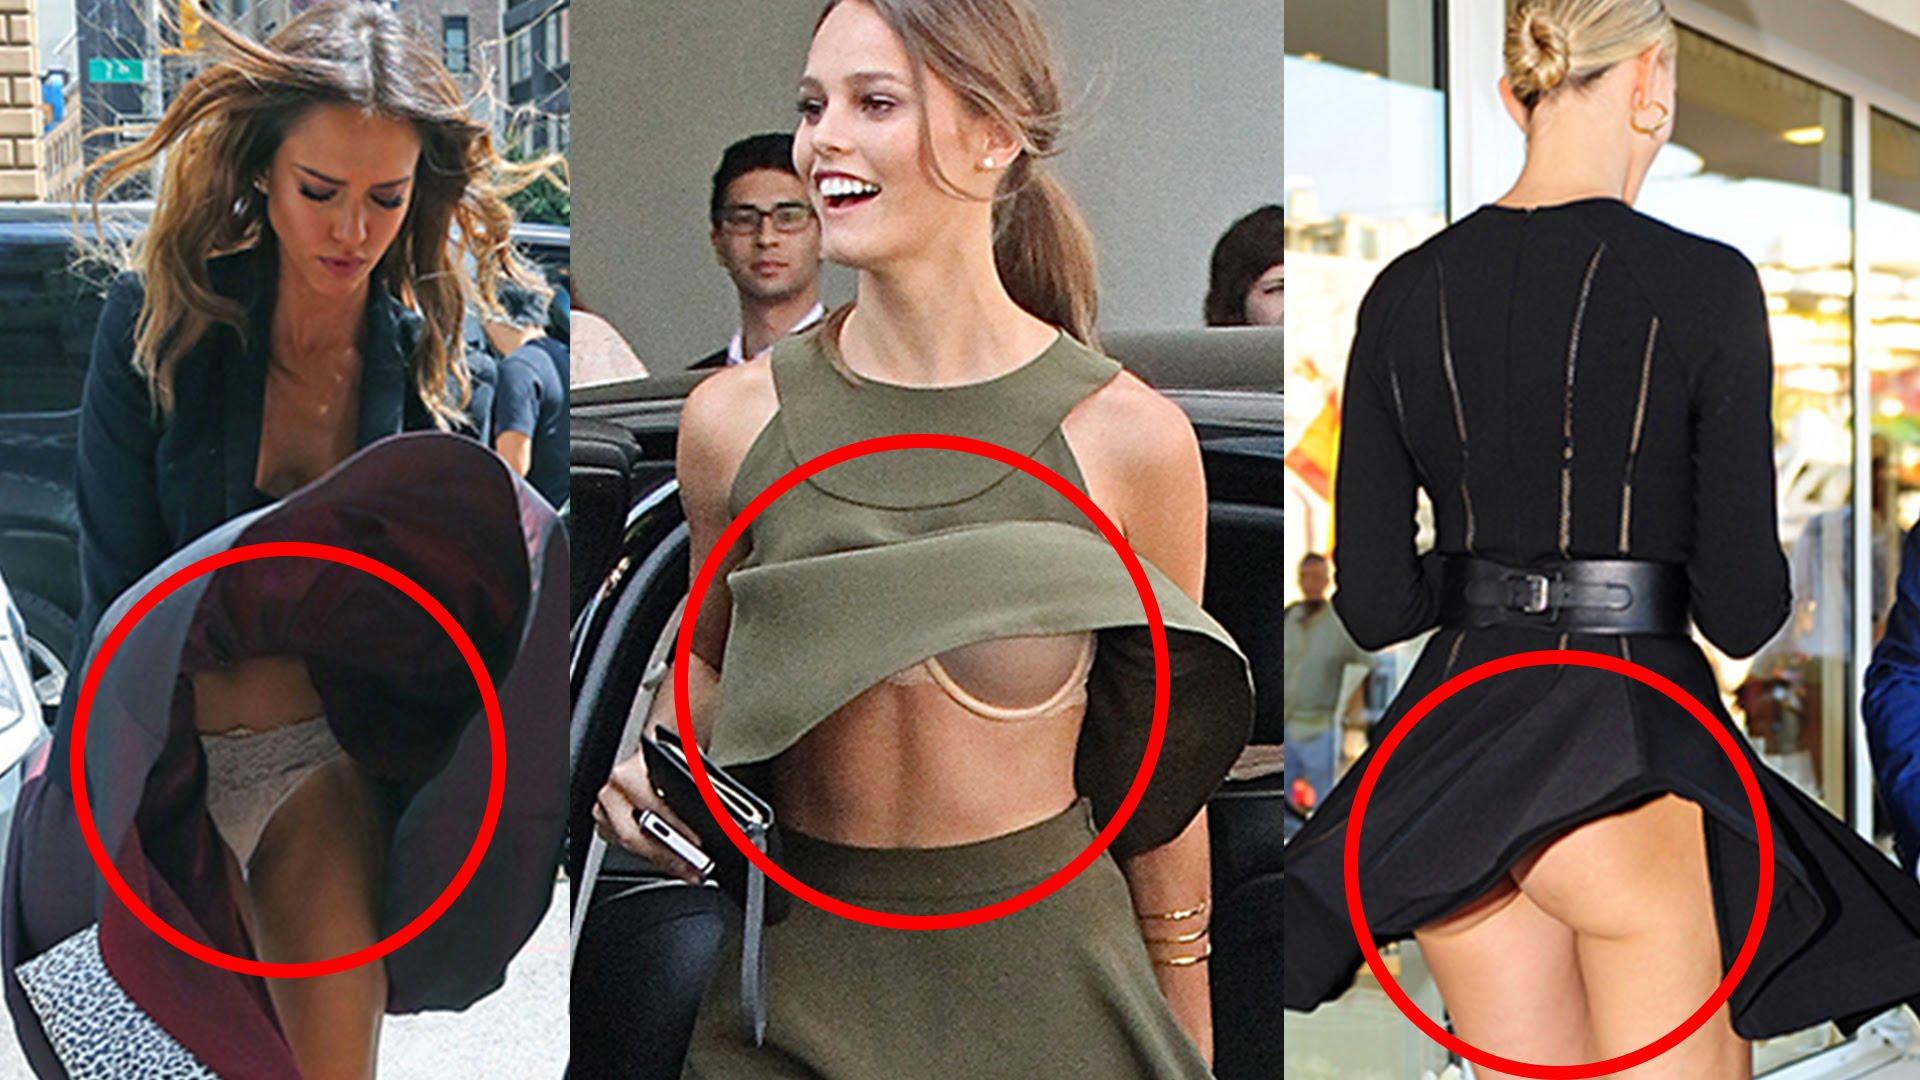 uncensored Hot malfunctions sports wardrobe